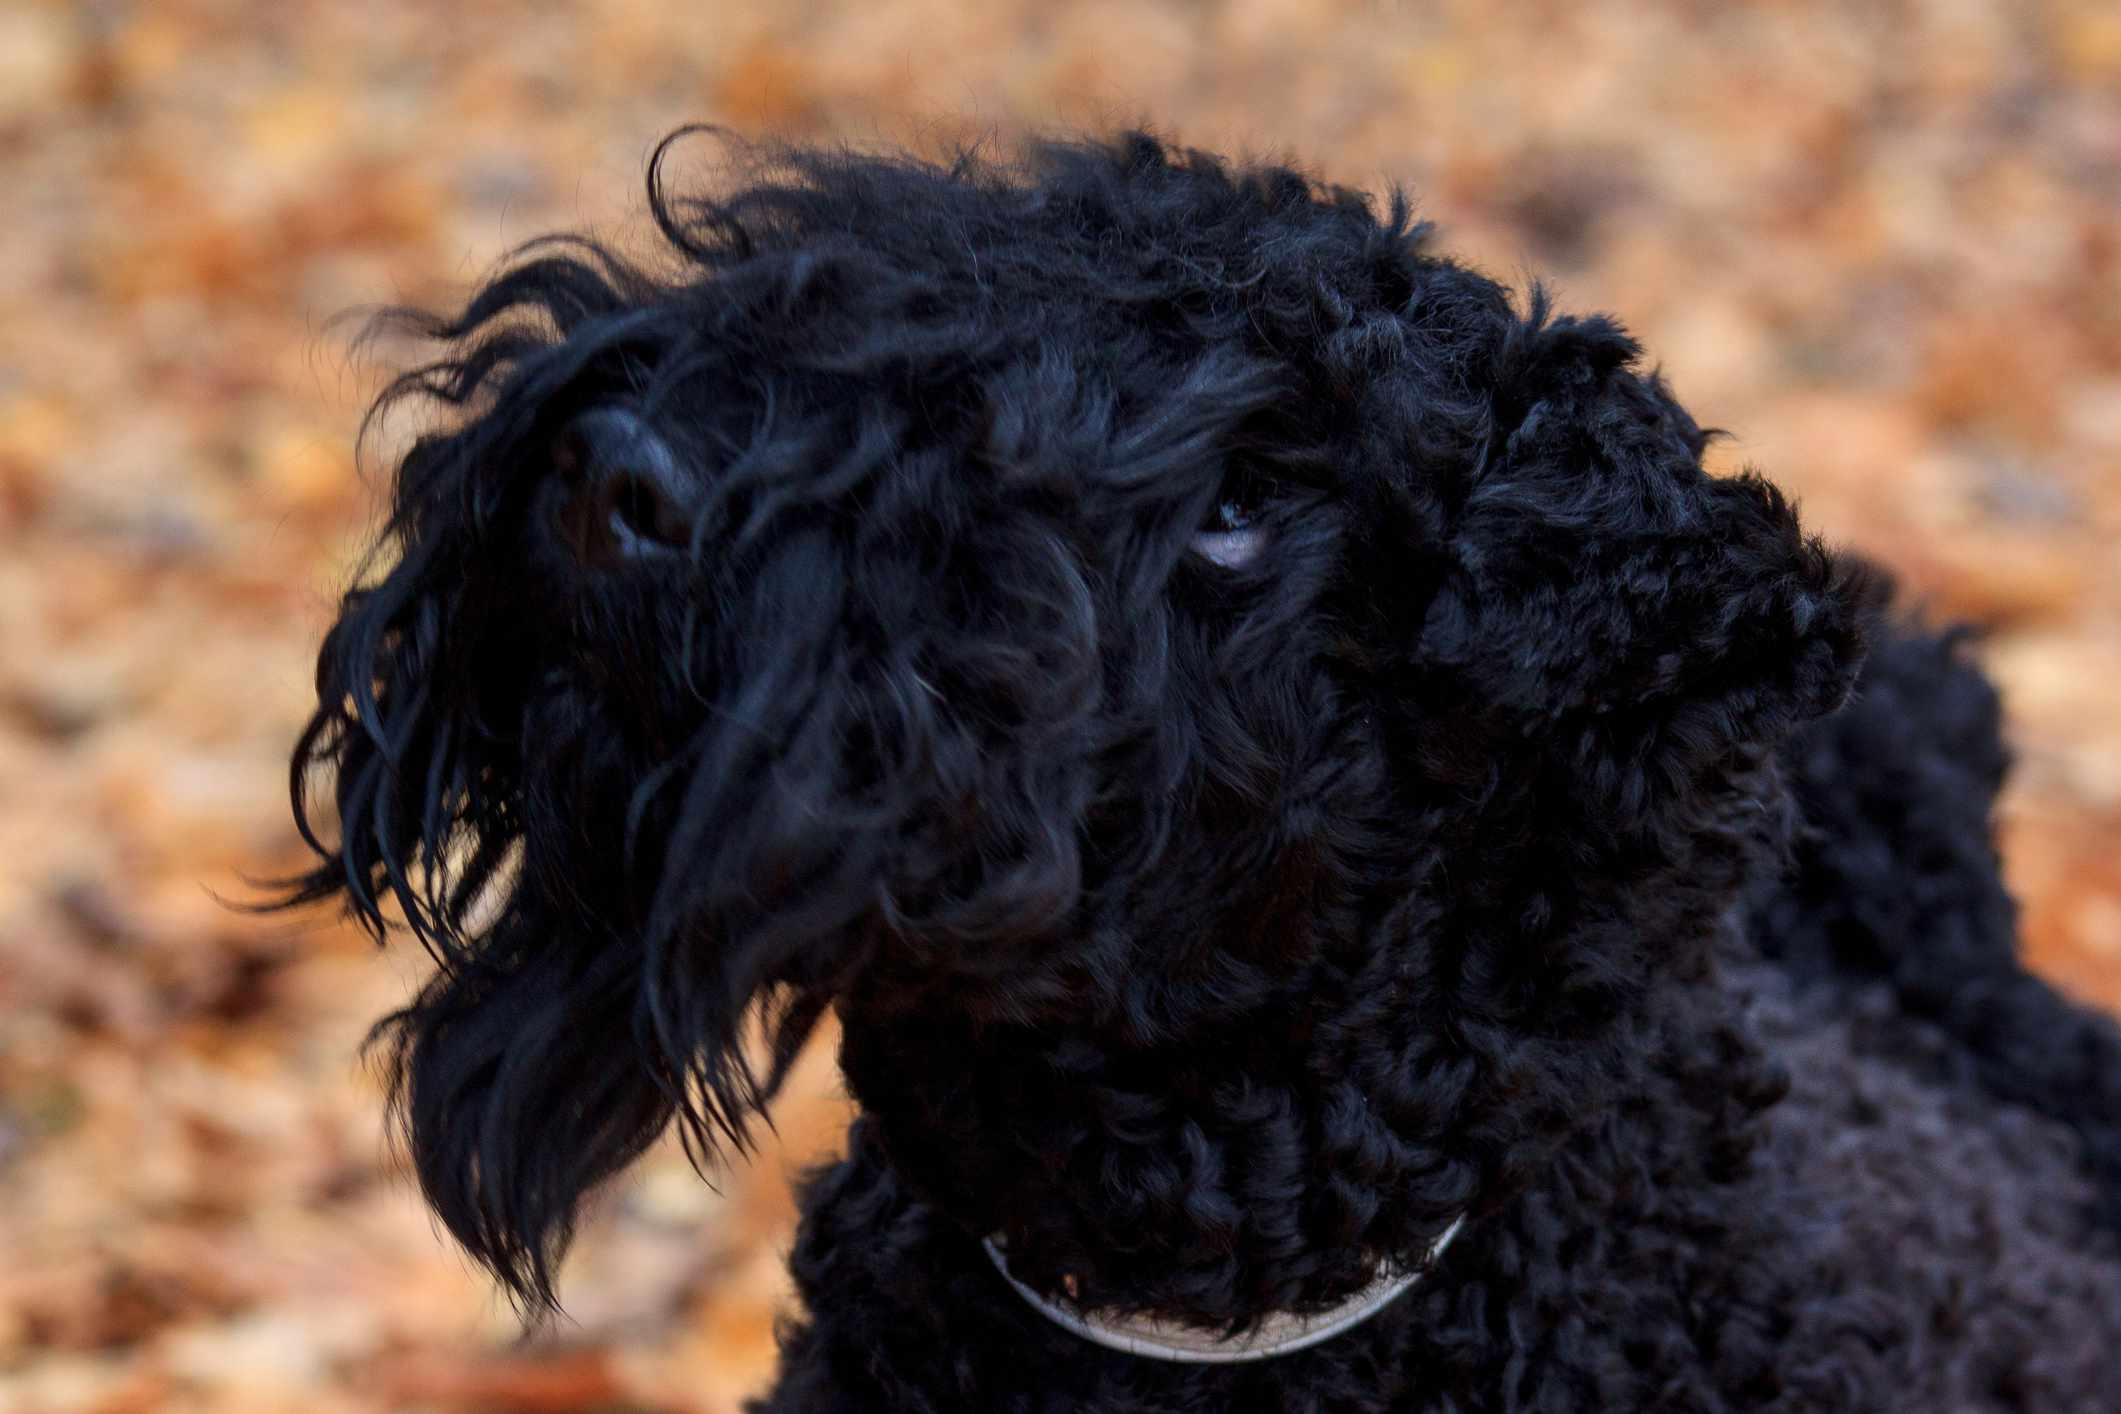 Young Kerry Blue terrier portrait